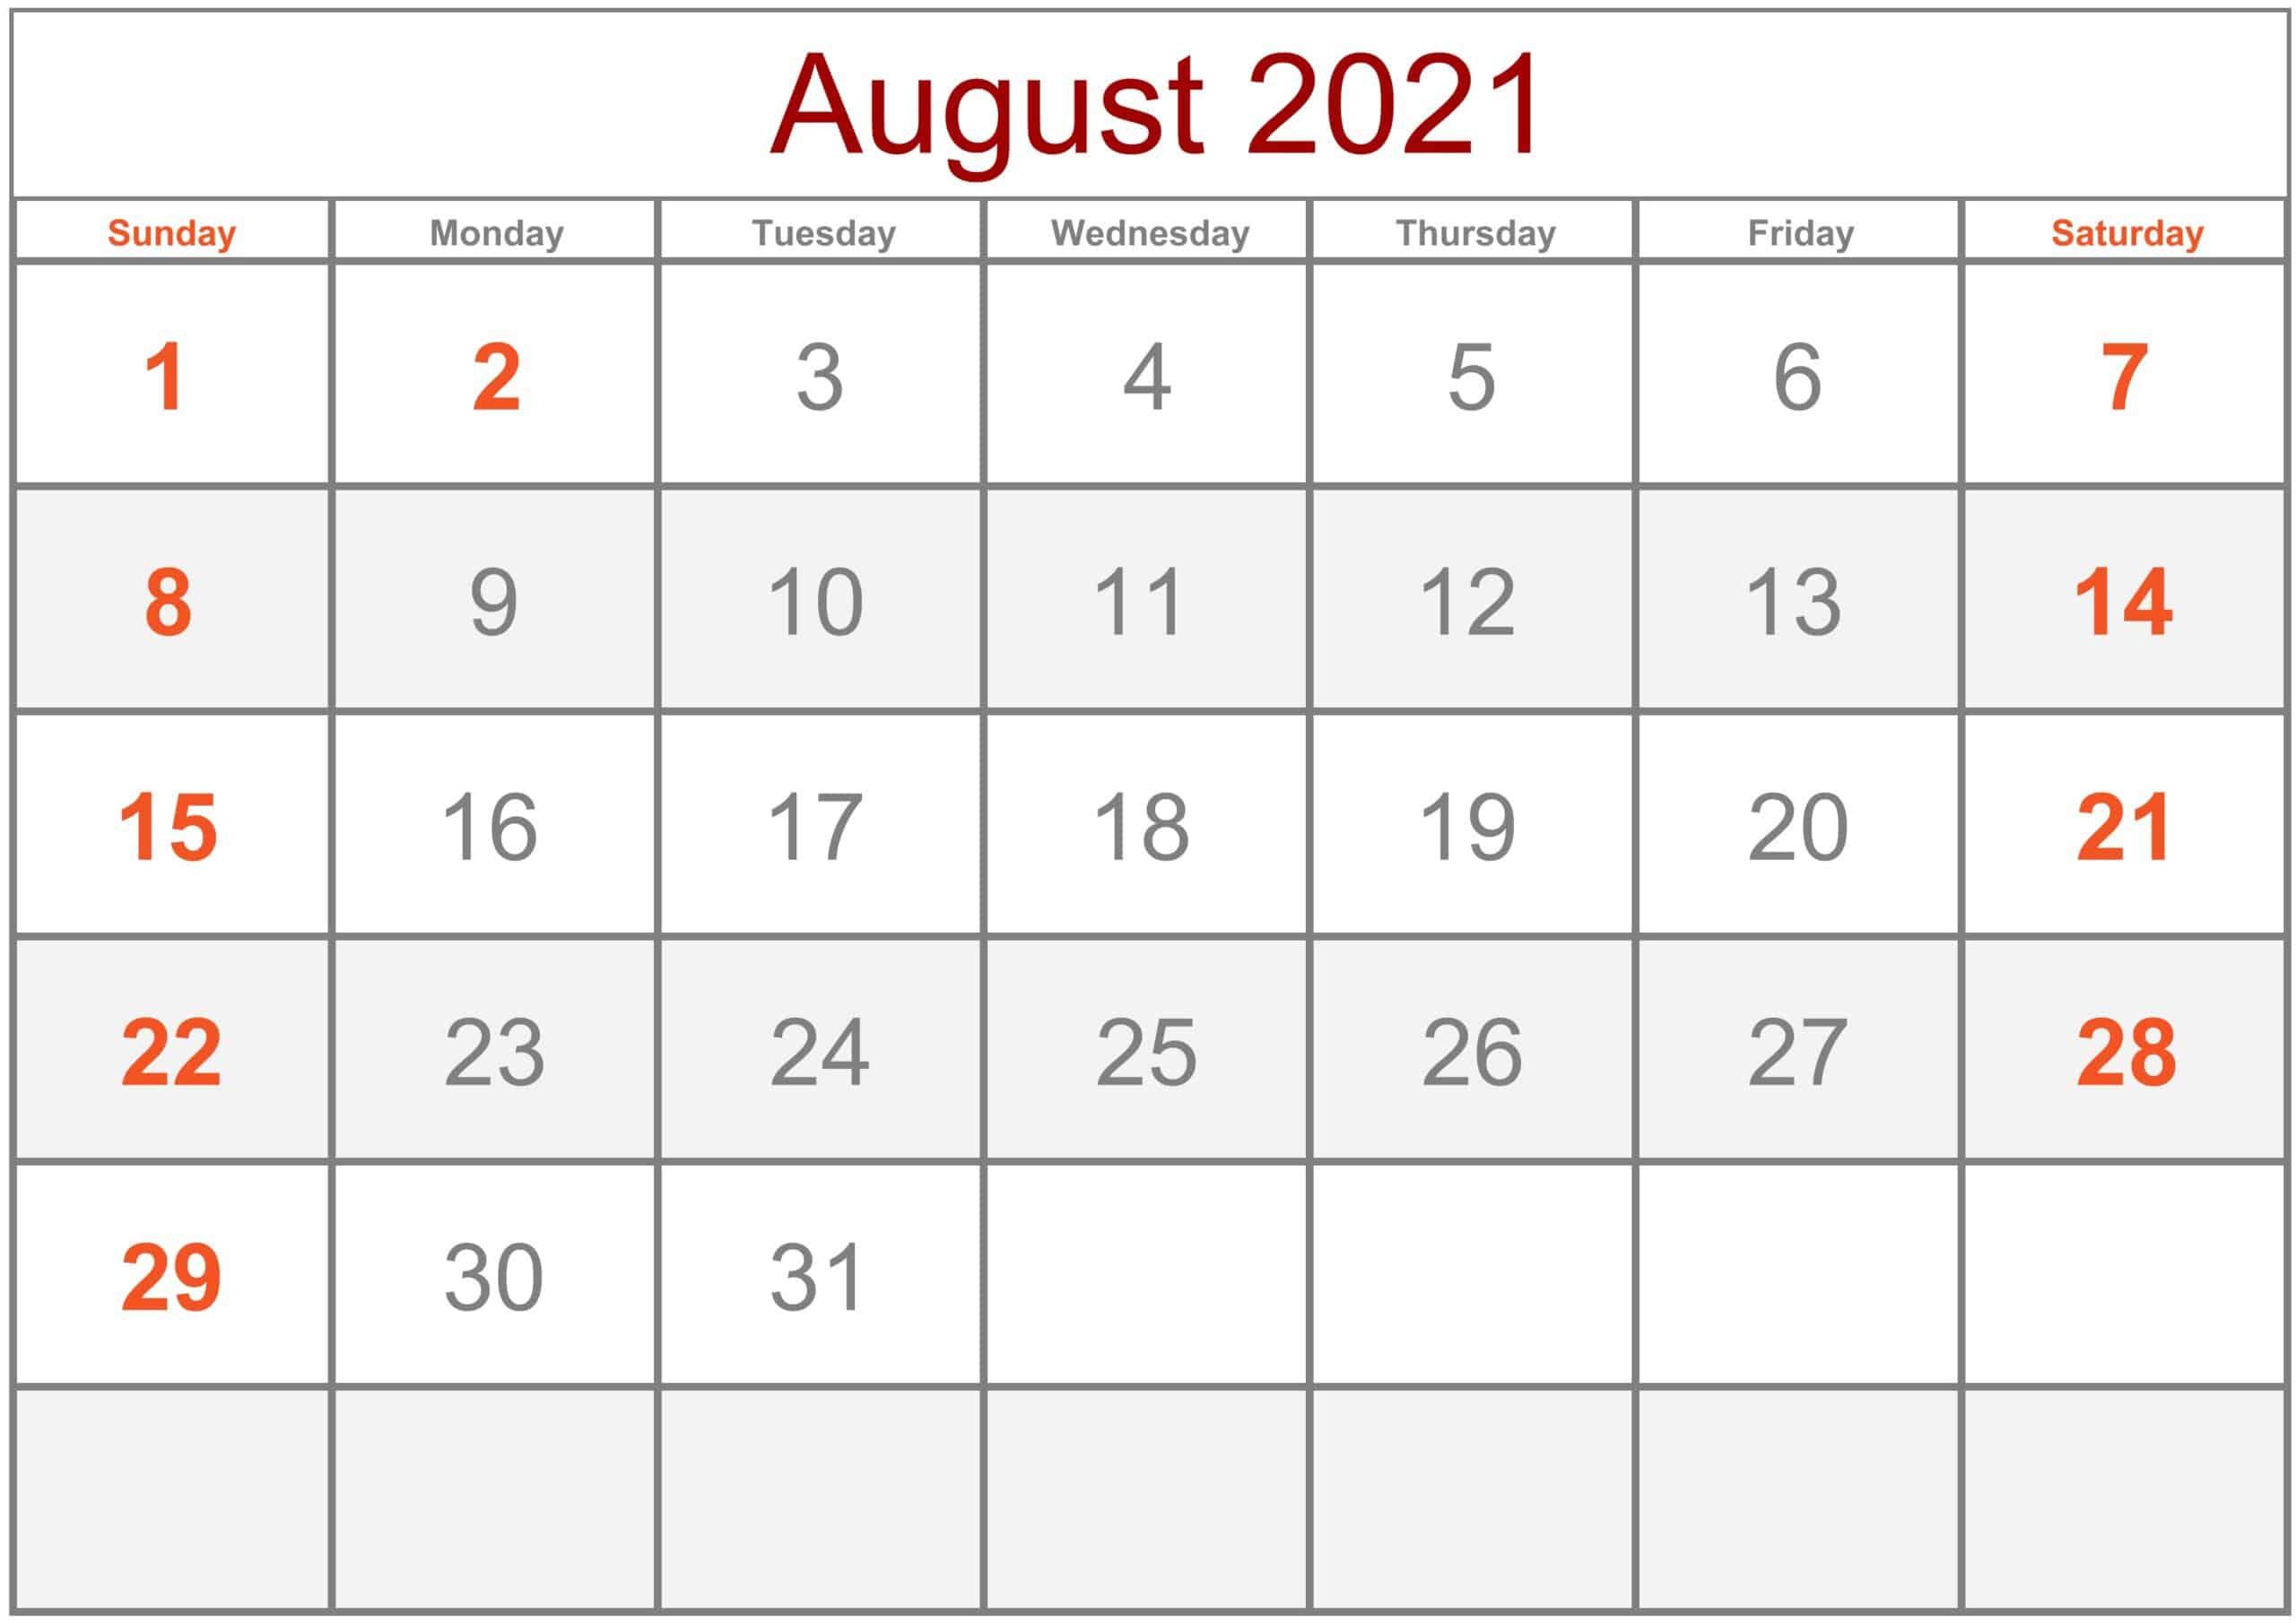 Calendar August 2021 Excel